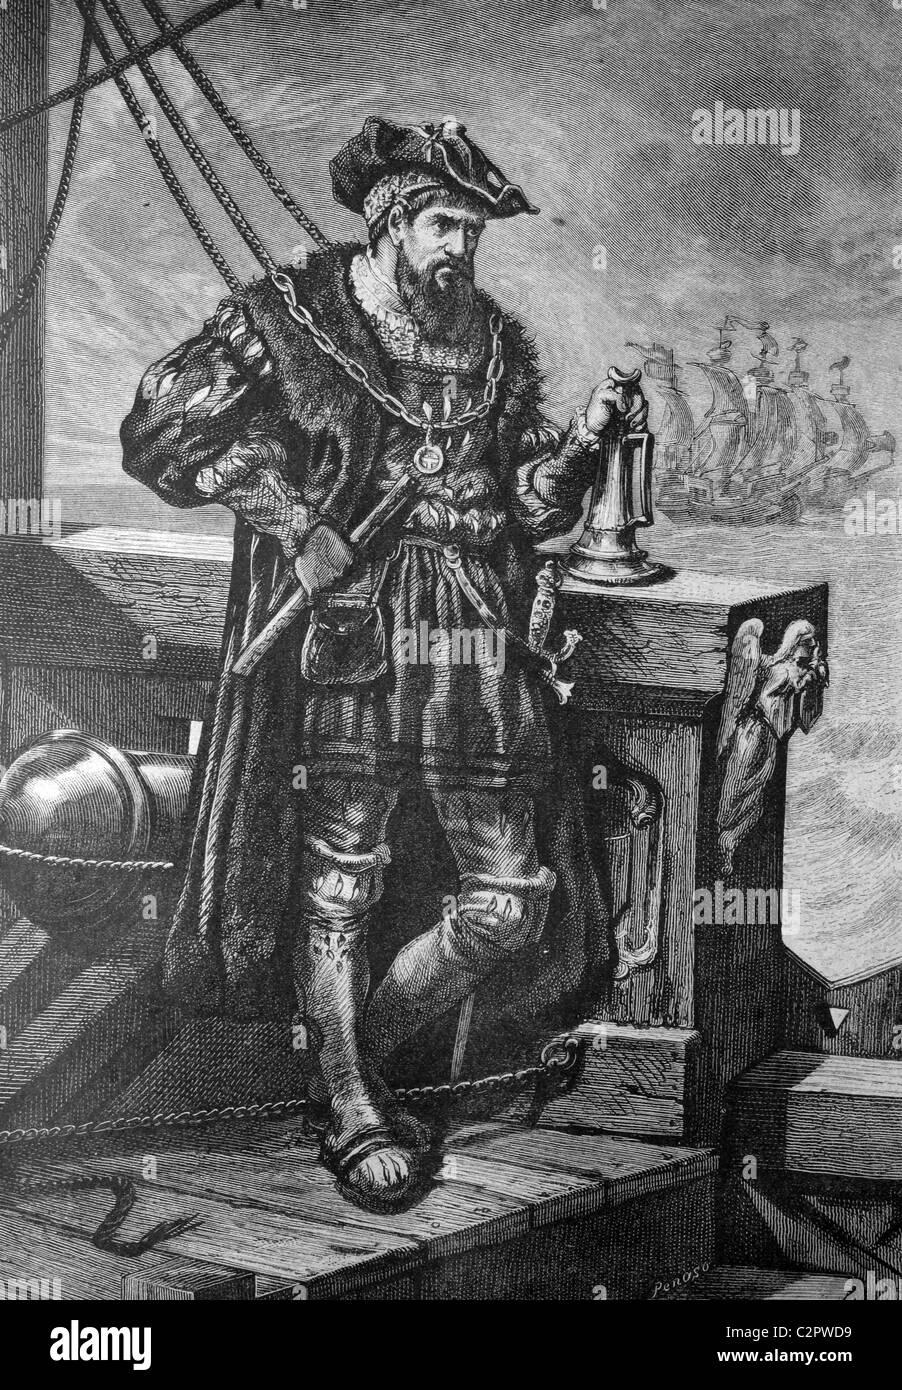 Vasco da Gama, 1469-1524, Portuguese navigator, historical illustration, about 1886 - Stock Image